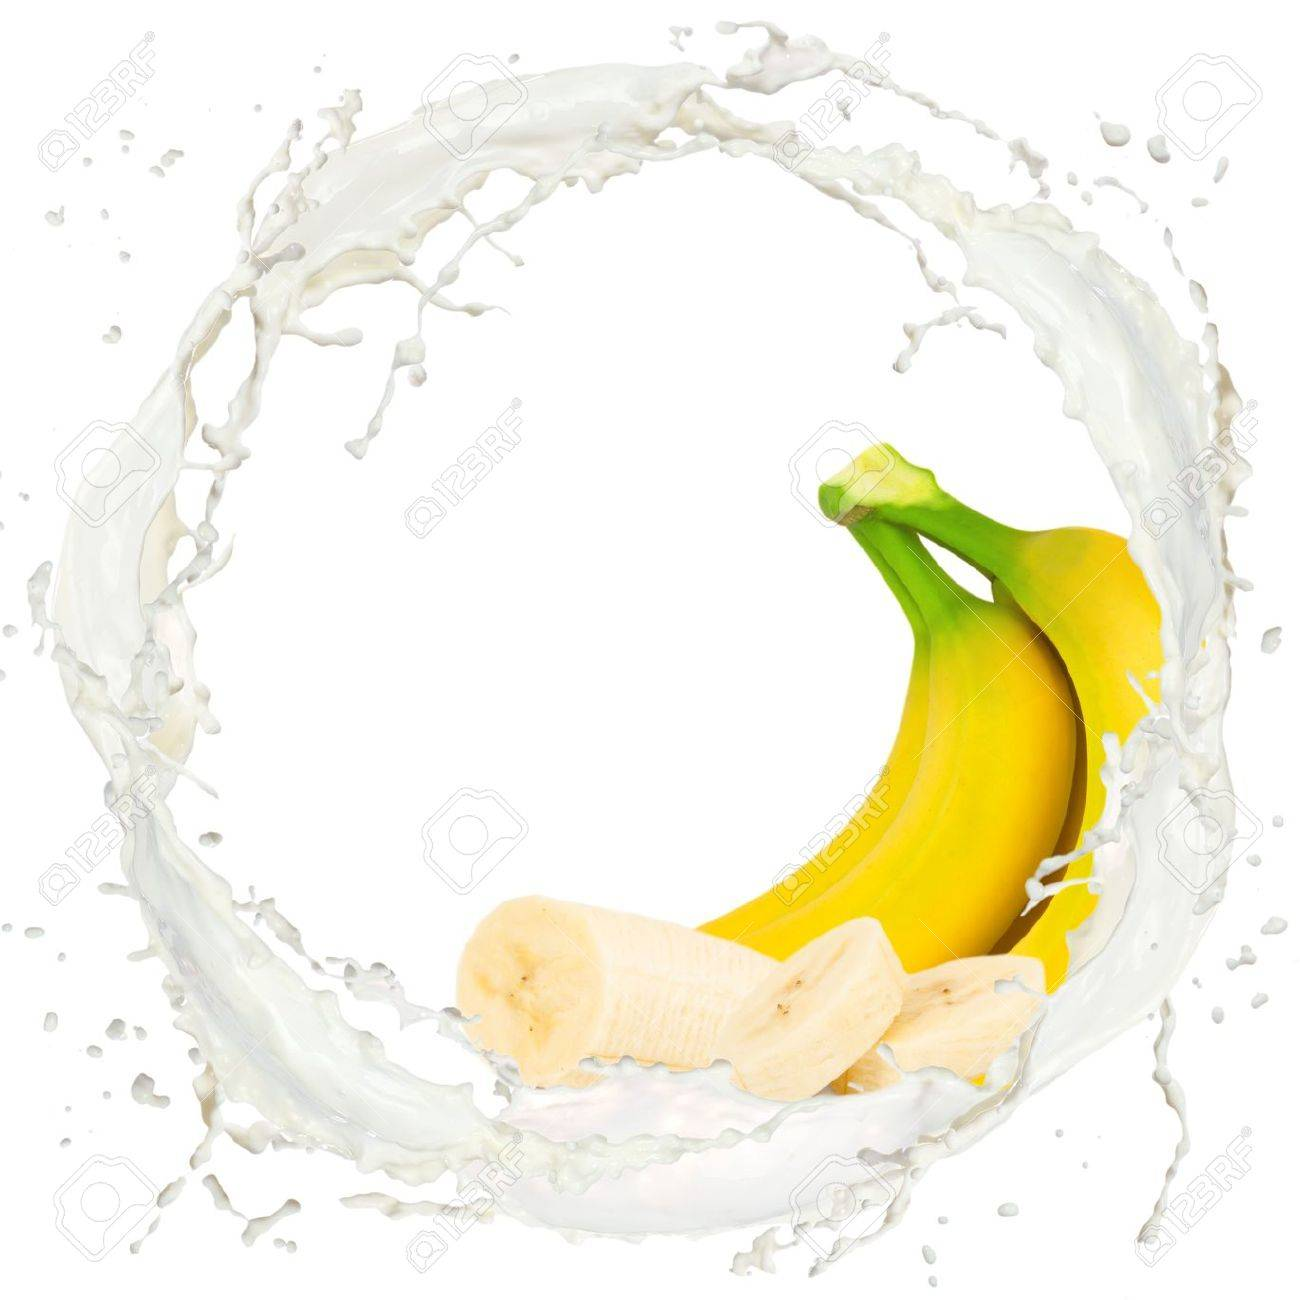 Milk splash with banana isolated on white Stock Photo - 14872662